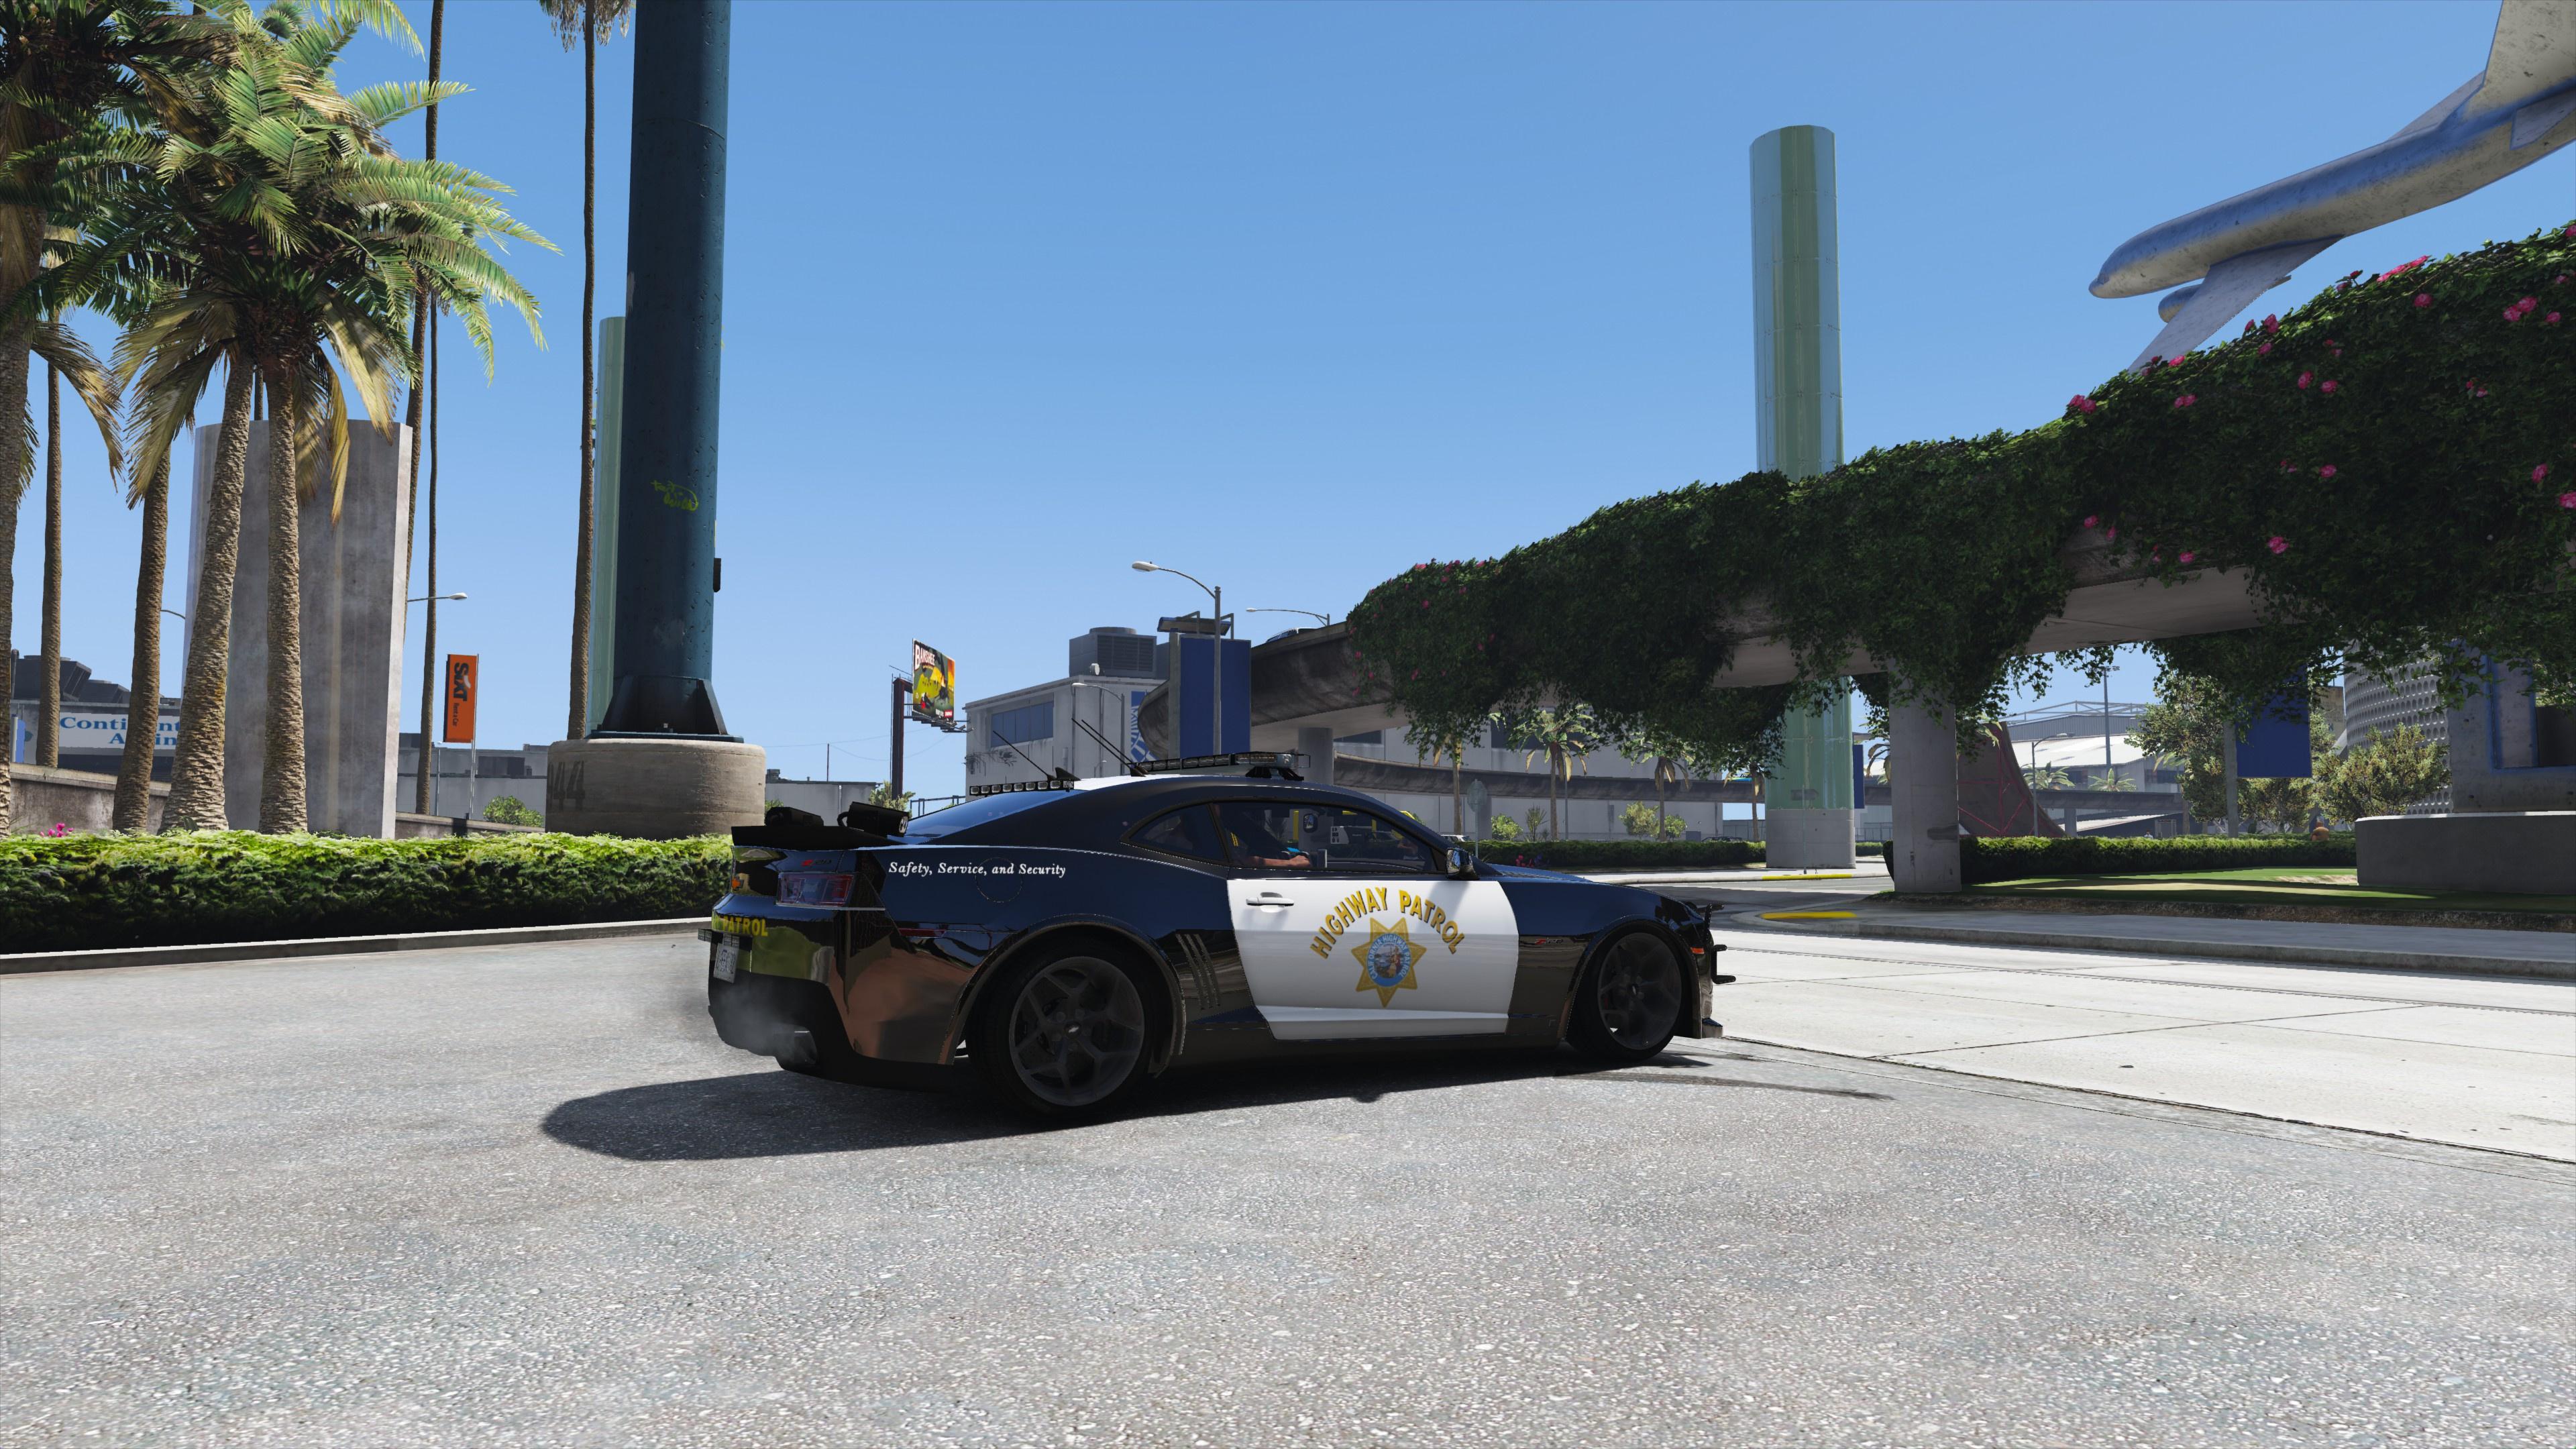 california highway patrol chp texture pack v2 4k gta5 mods com